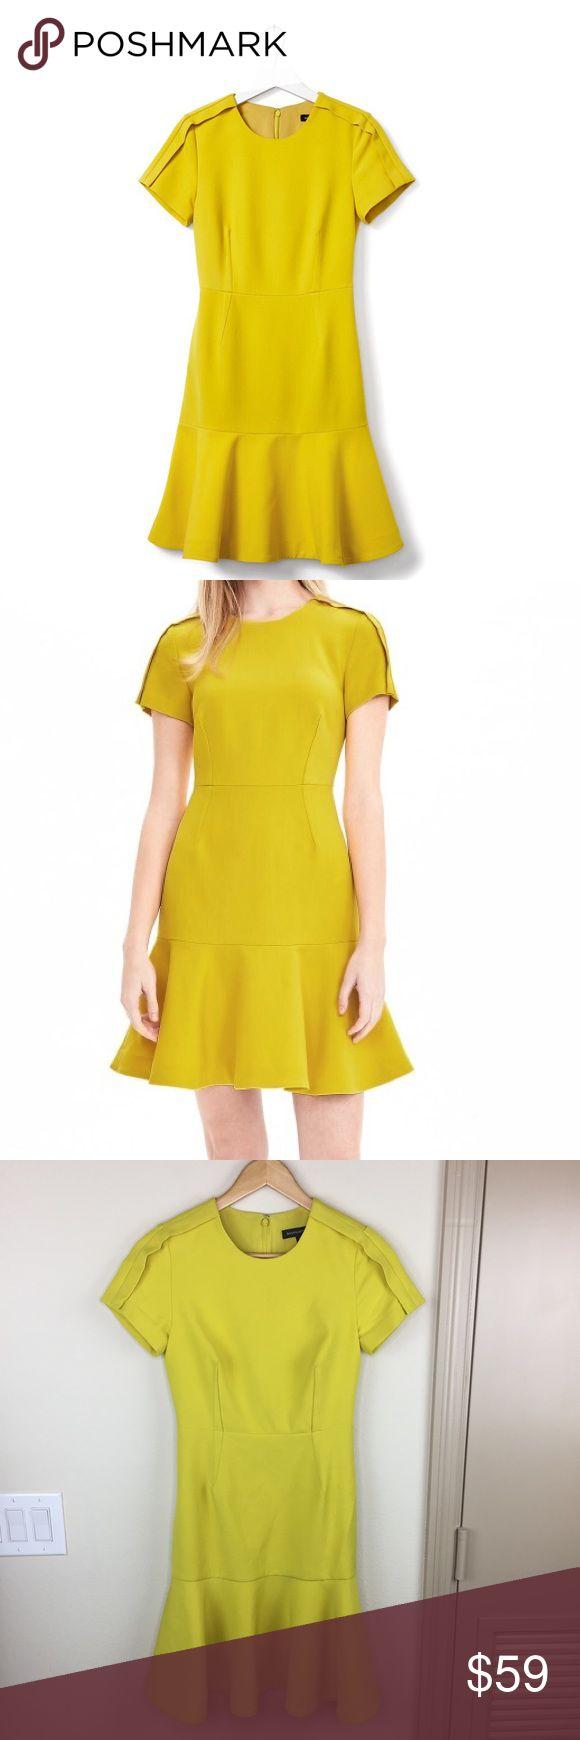 BANANA REPUBLIC Chartreuse Dress BANANA REPUBLIC Chartreuse Dress- Size 0. This dress is stunning! Banana Republic Dresses